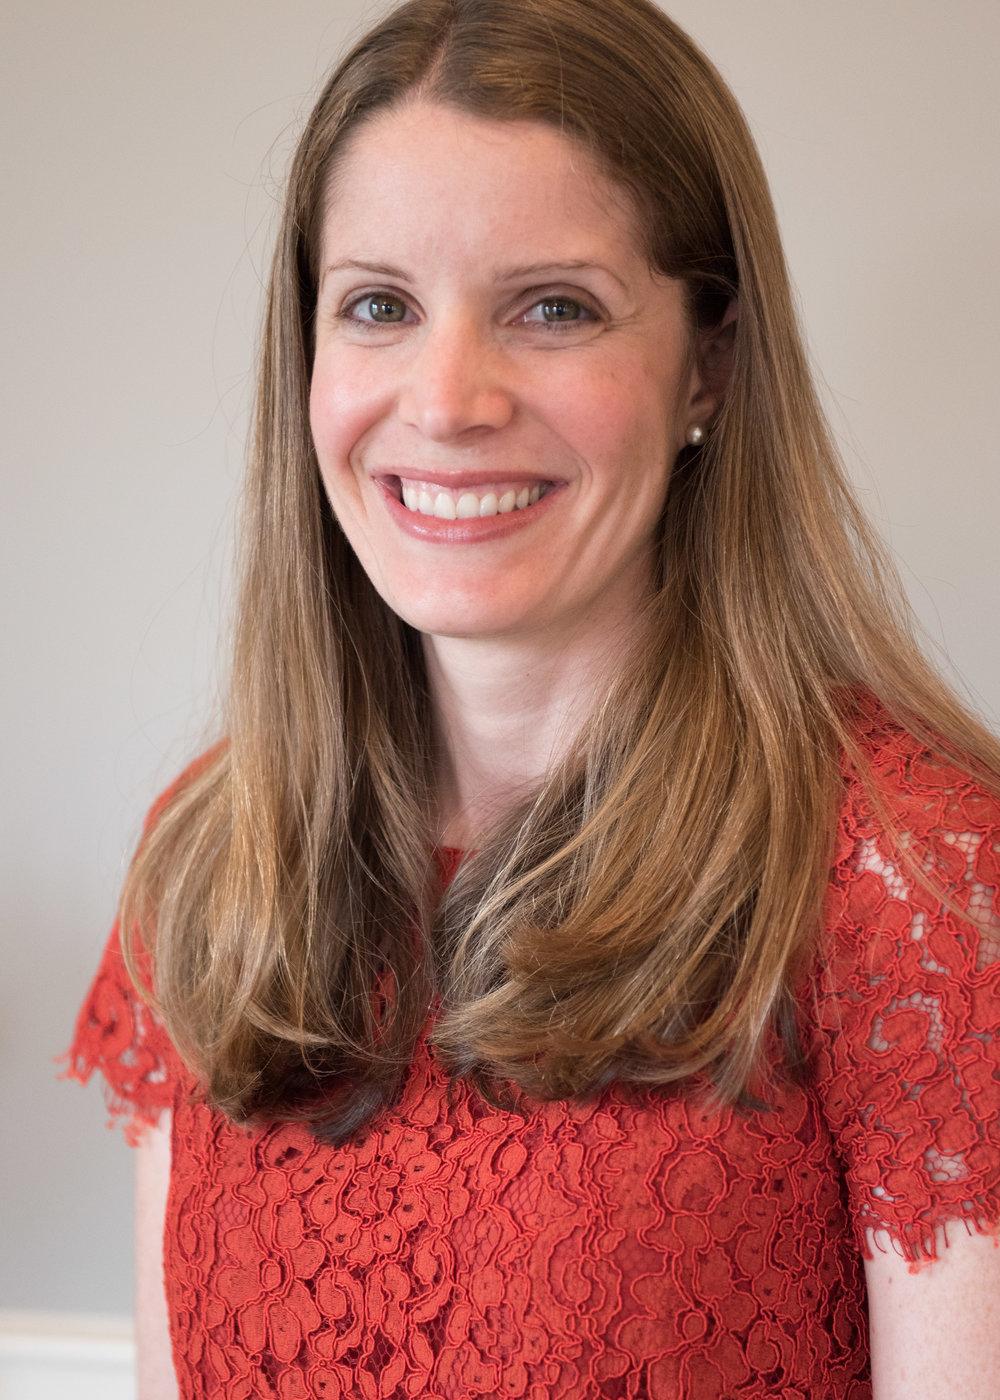 Dr. Brooke Blicher, DMD